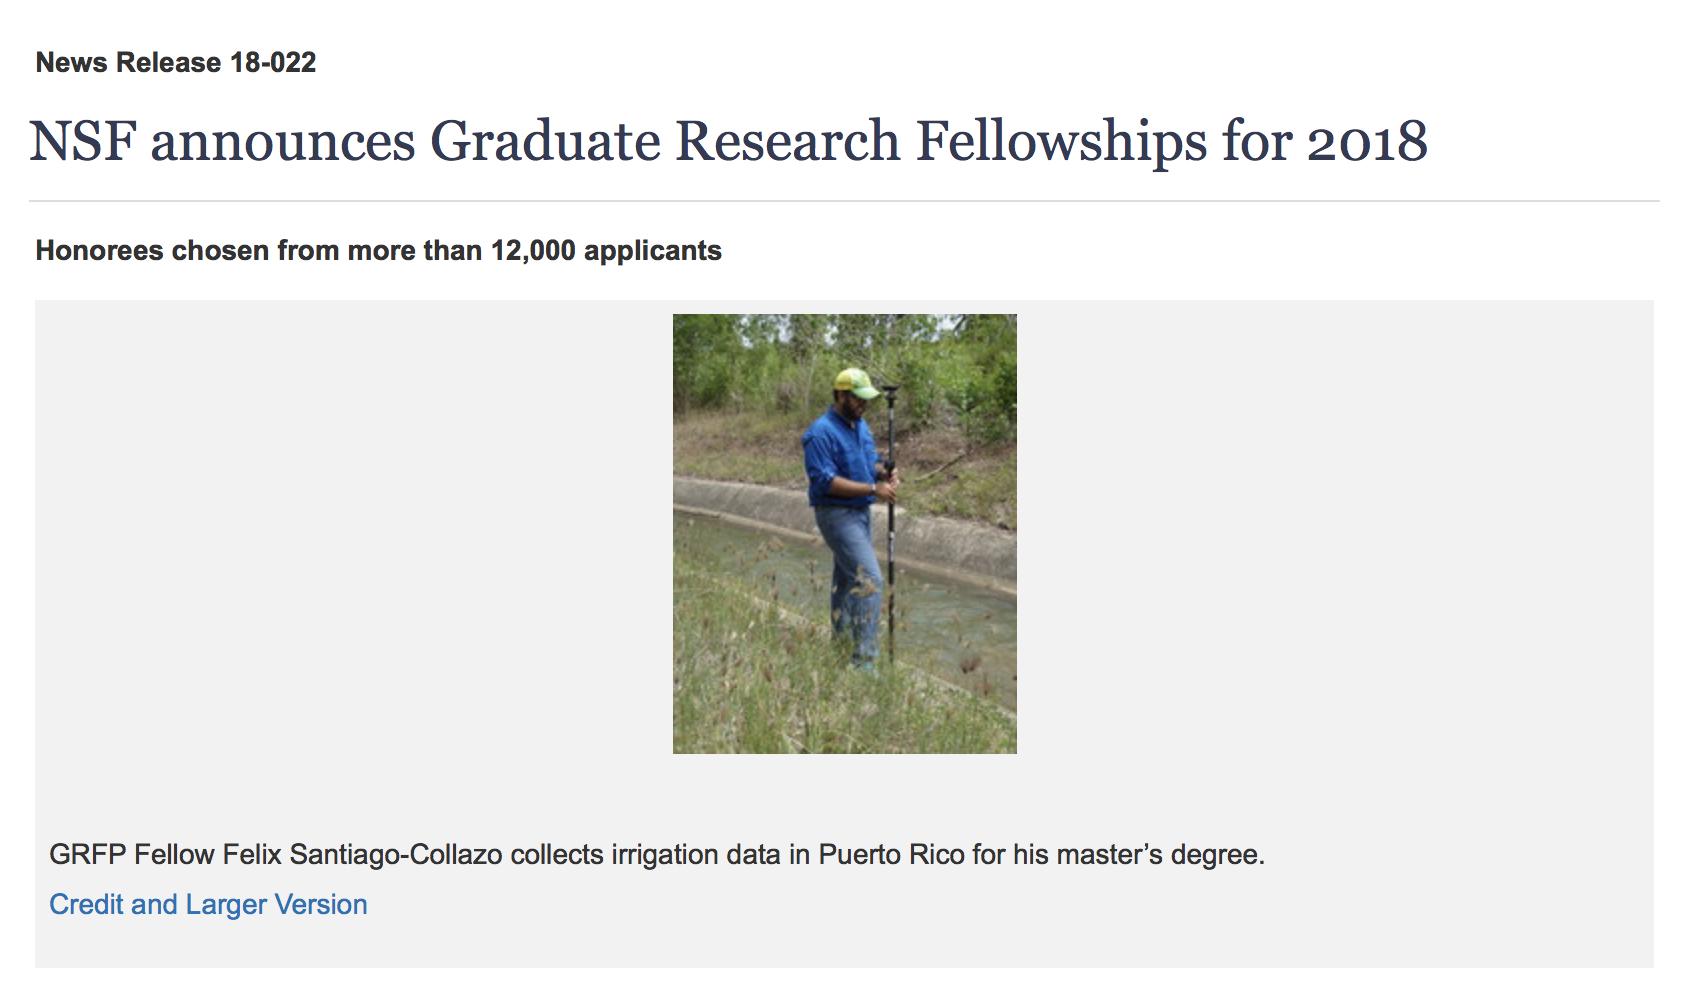 Morgan DiCarlo '16 Awarded Prestigious NSF Graduate Research